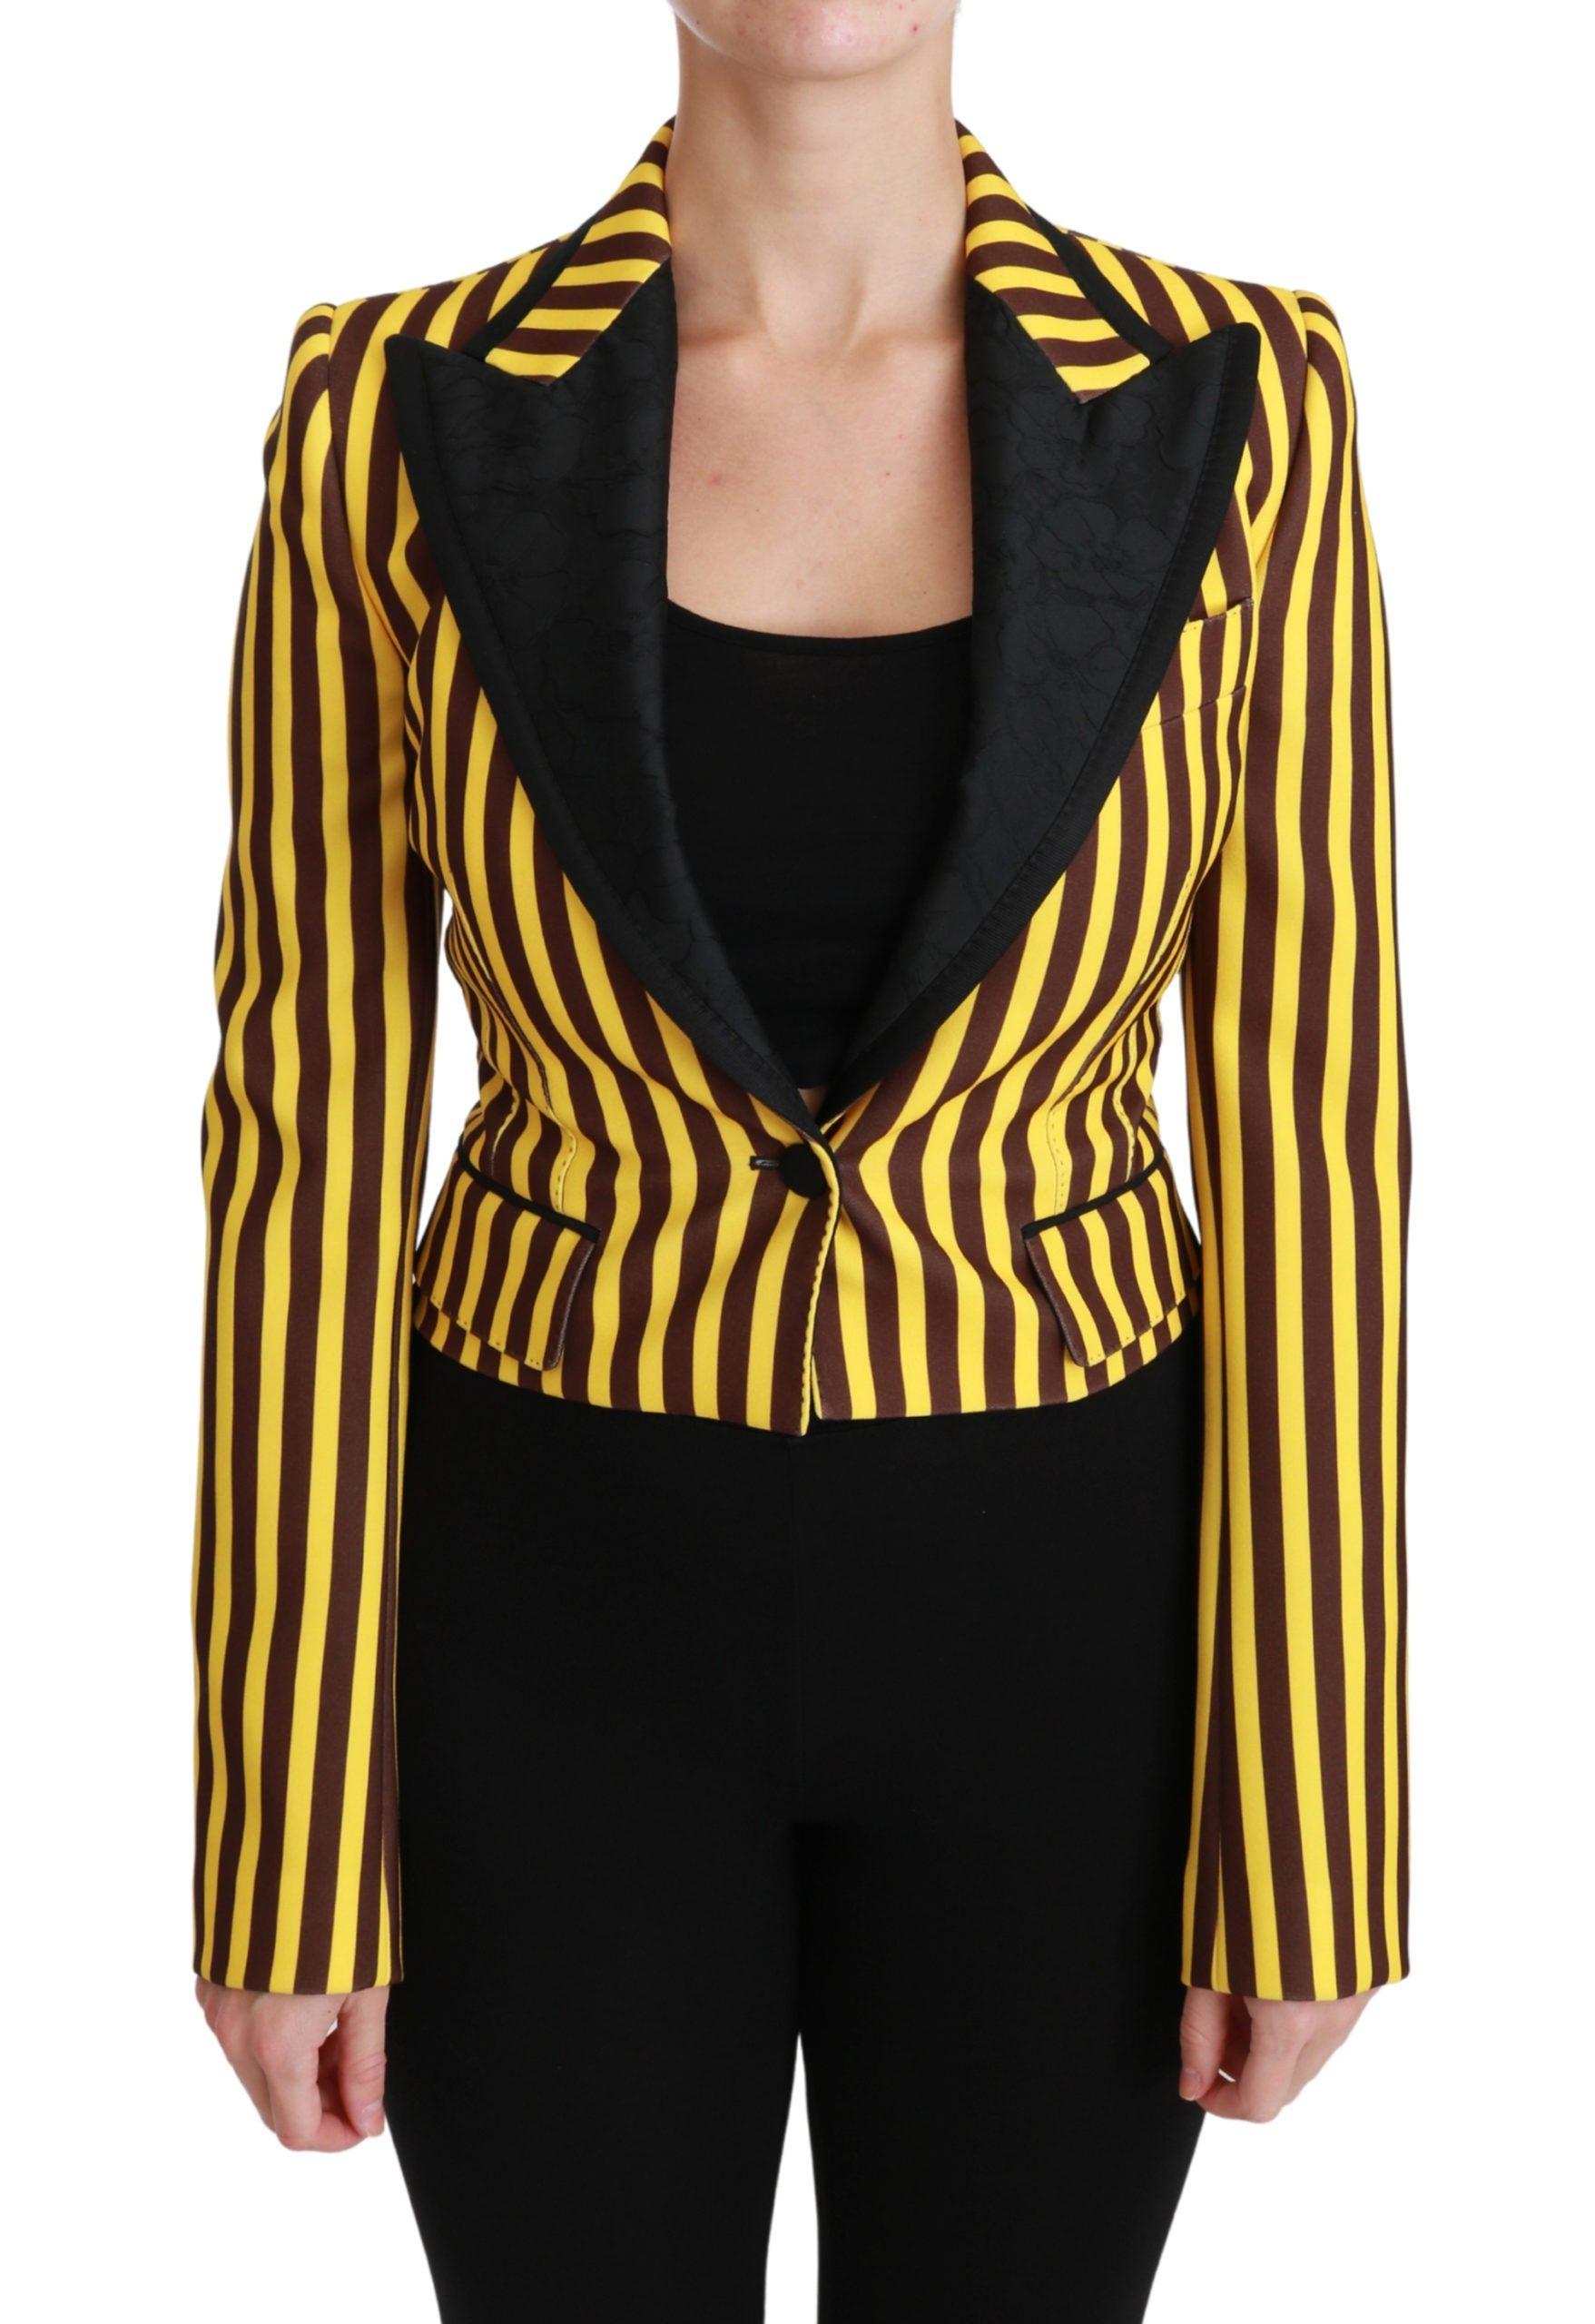 Dolce & Gabbana Women's Striped Jacket Blazer Yellow JKT2560 - IT40 S